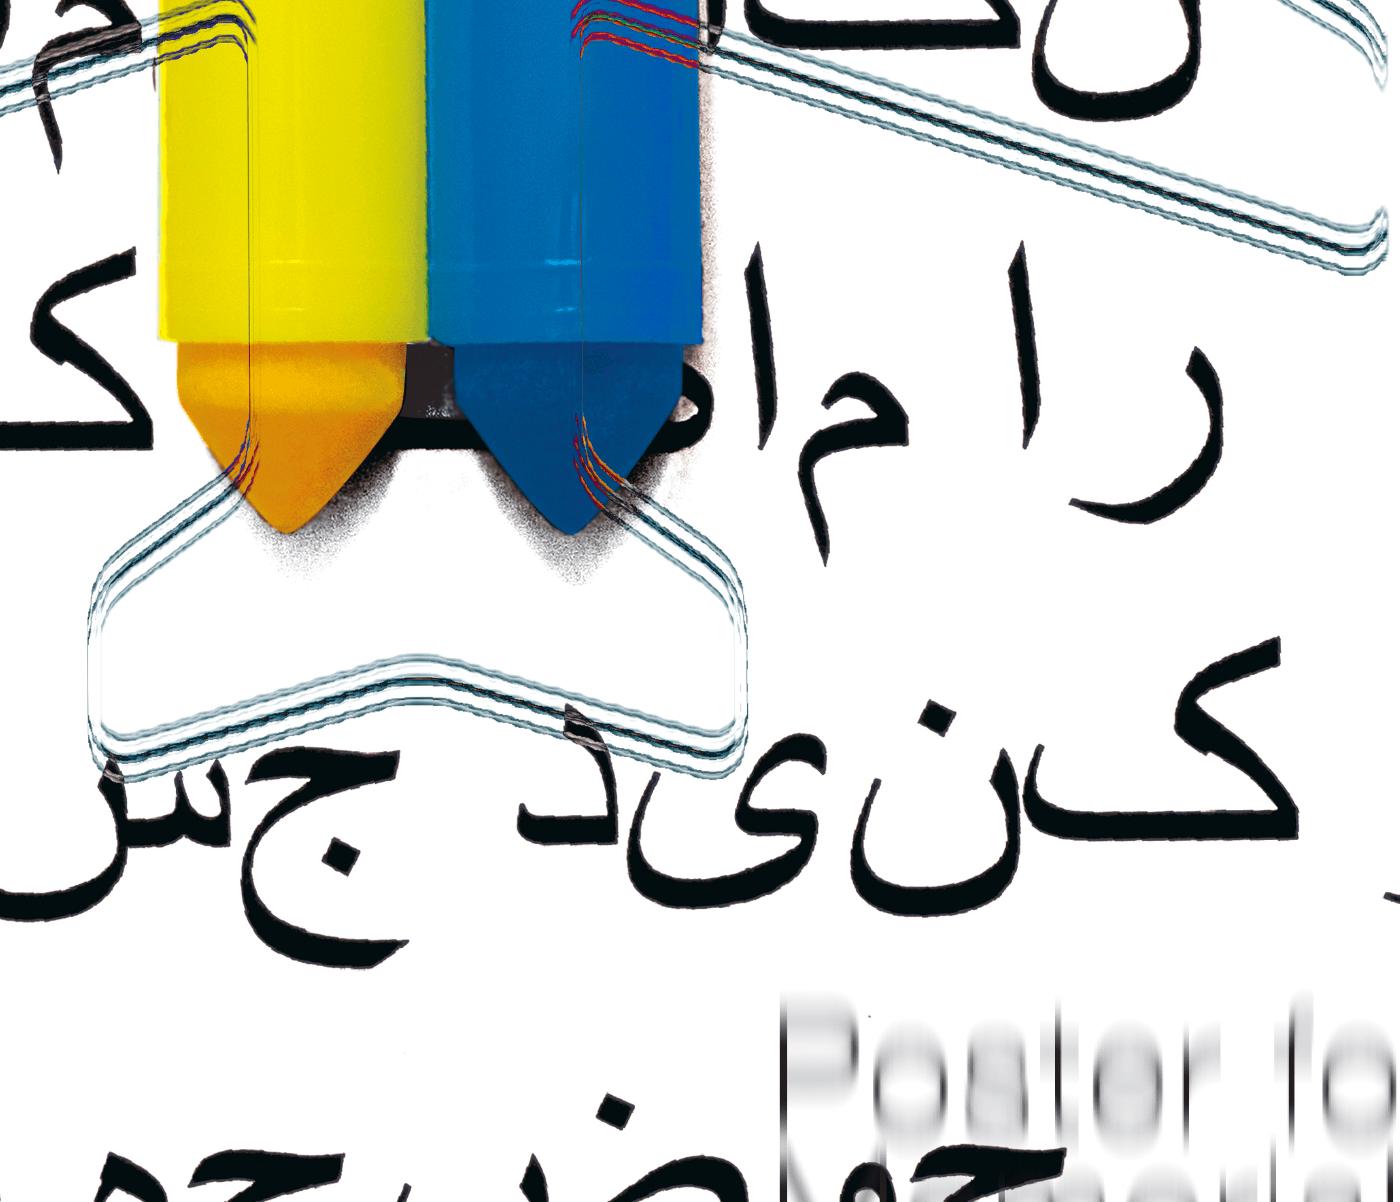 752 ukraine design flight Francesco Mazzenga poster posterdesign